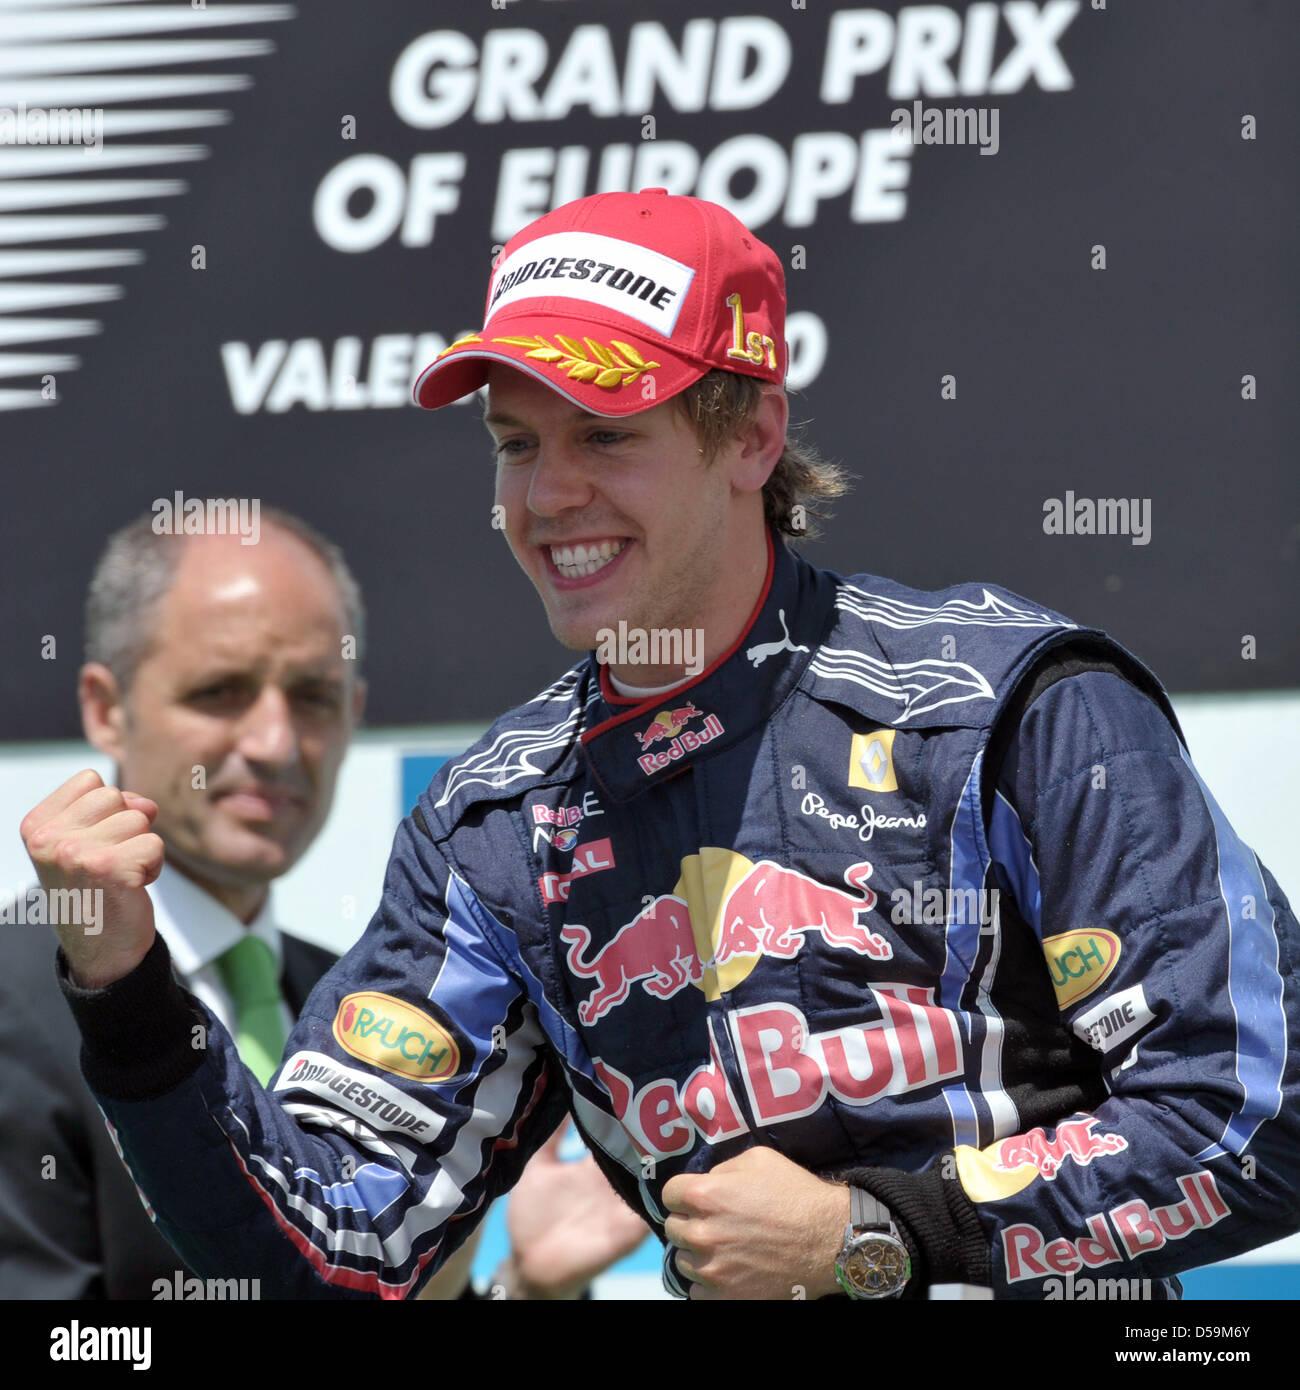 bbeb09fc German driver Sebastian Vettel of Red Bull Racing celebrates winning at the  street circuit of Valencia, Spain, 27 June 2010. The 2010 Formula 1 Grand  Prix ...